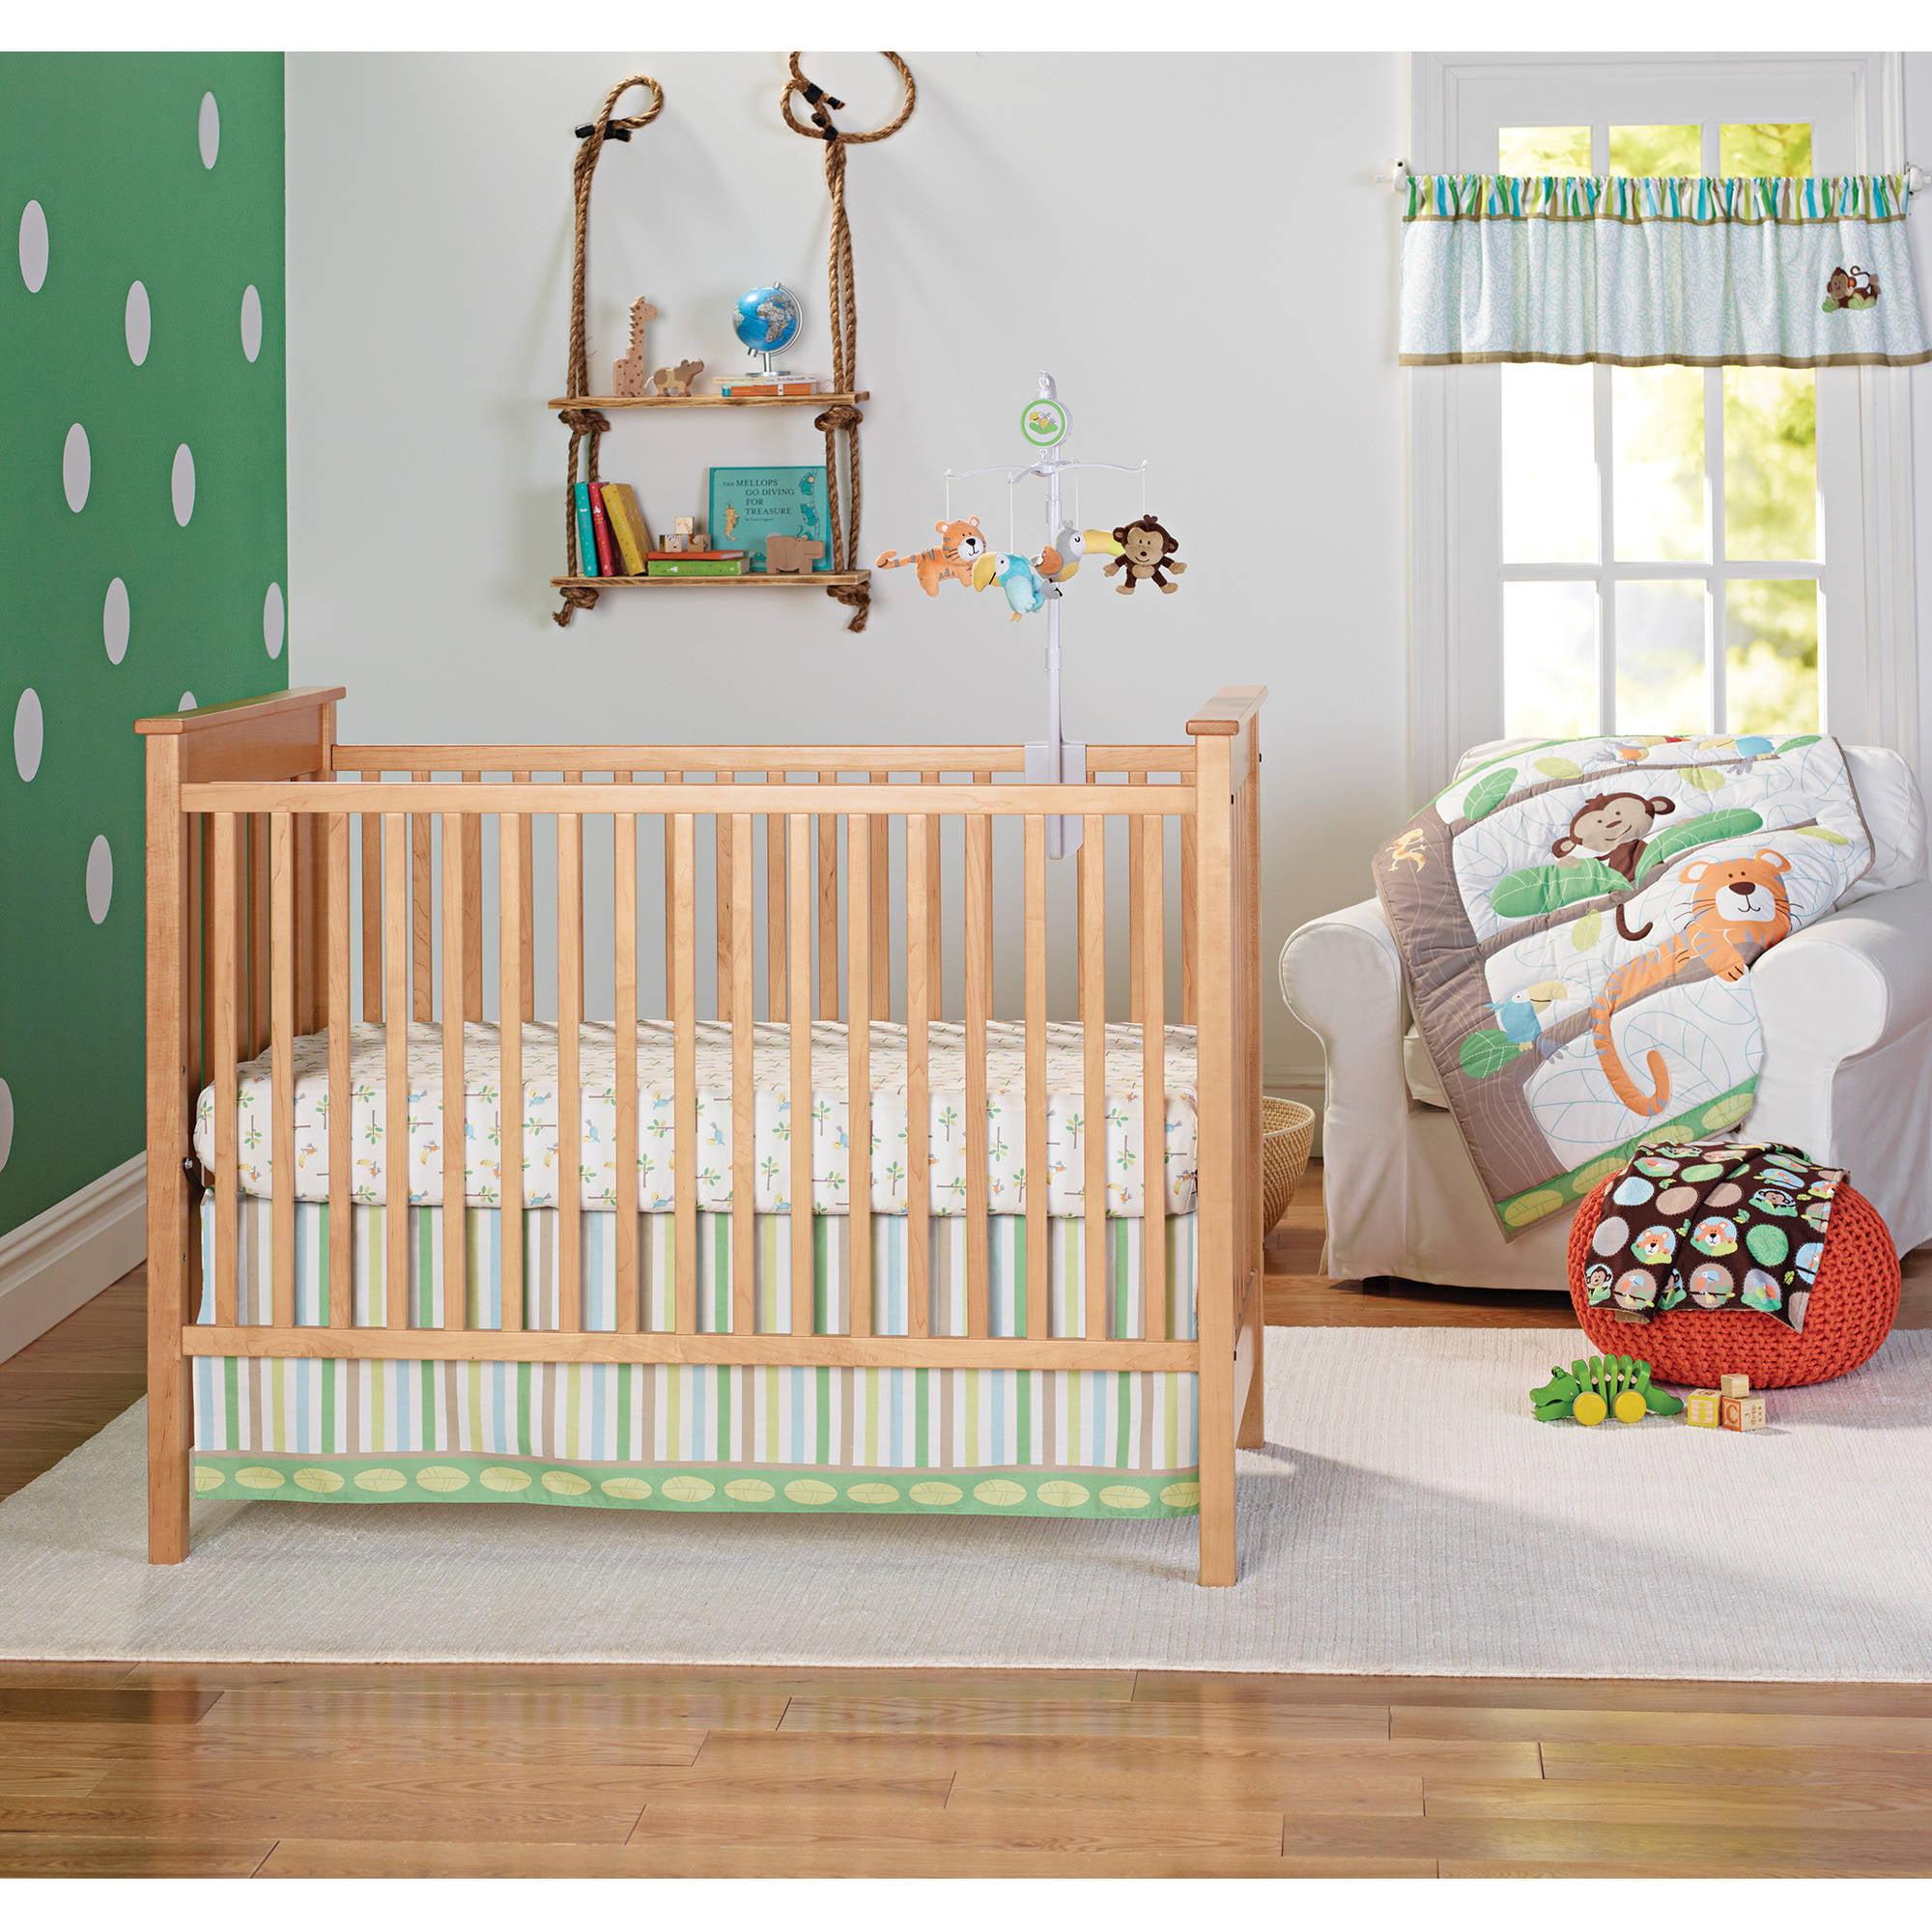 Garanimals Tropical Tree Top 3-Piece Crib Bedding Set